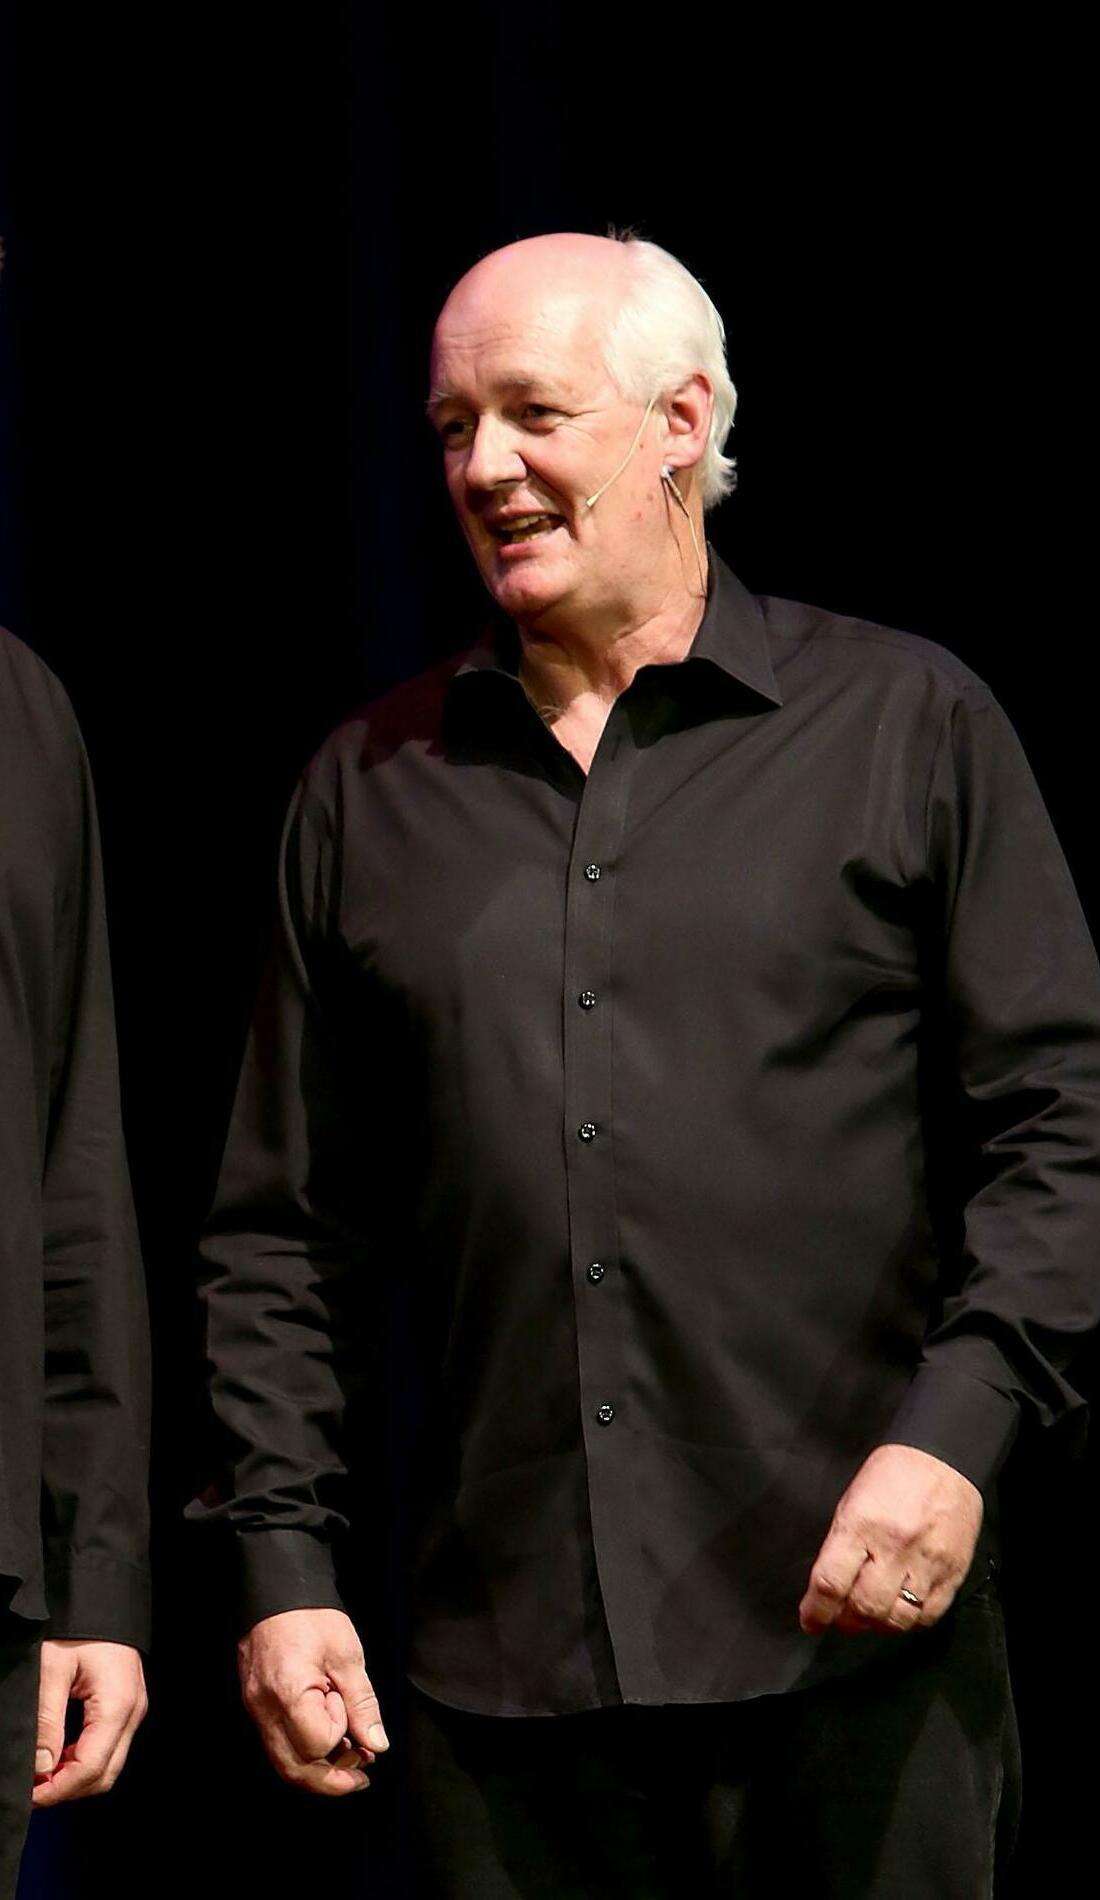 A Colin Mochrie & Brad Sherwood live event